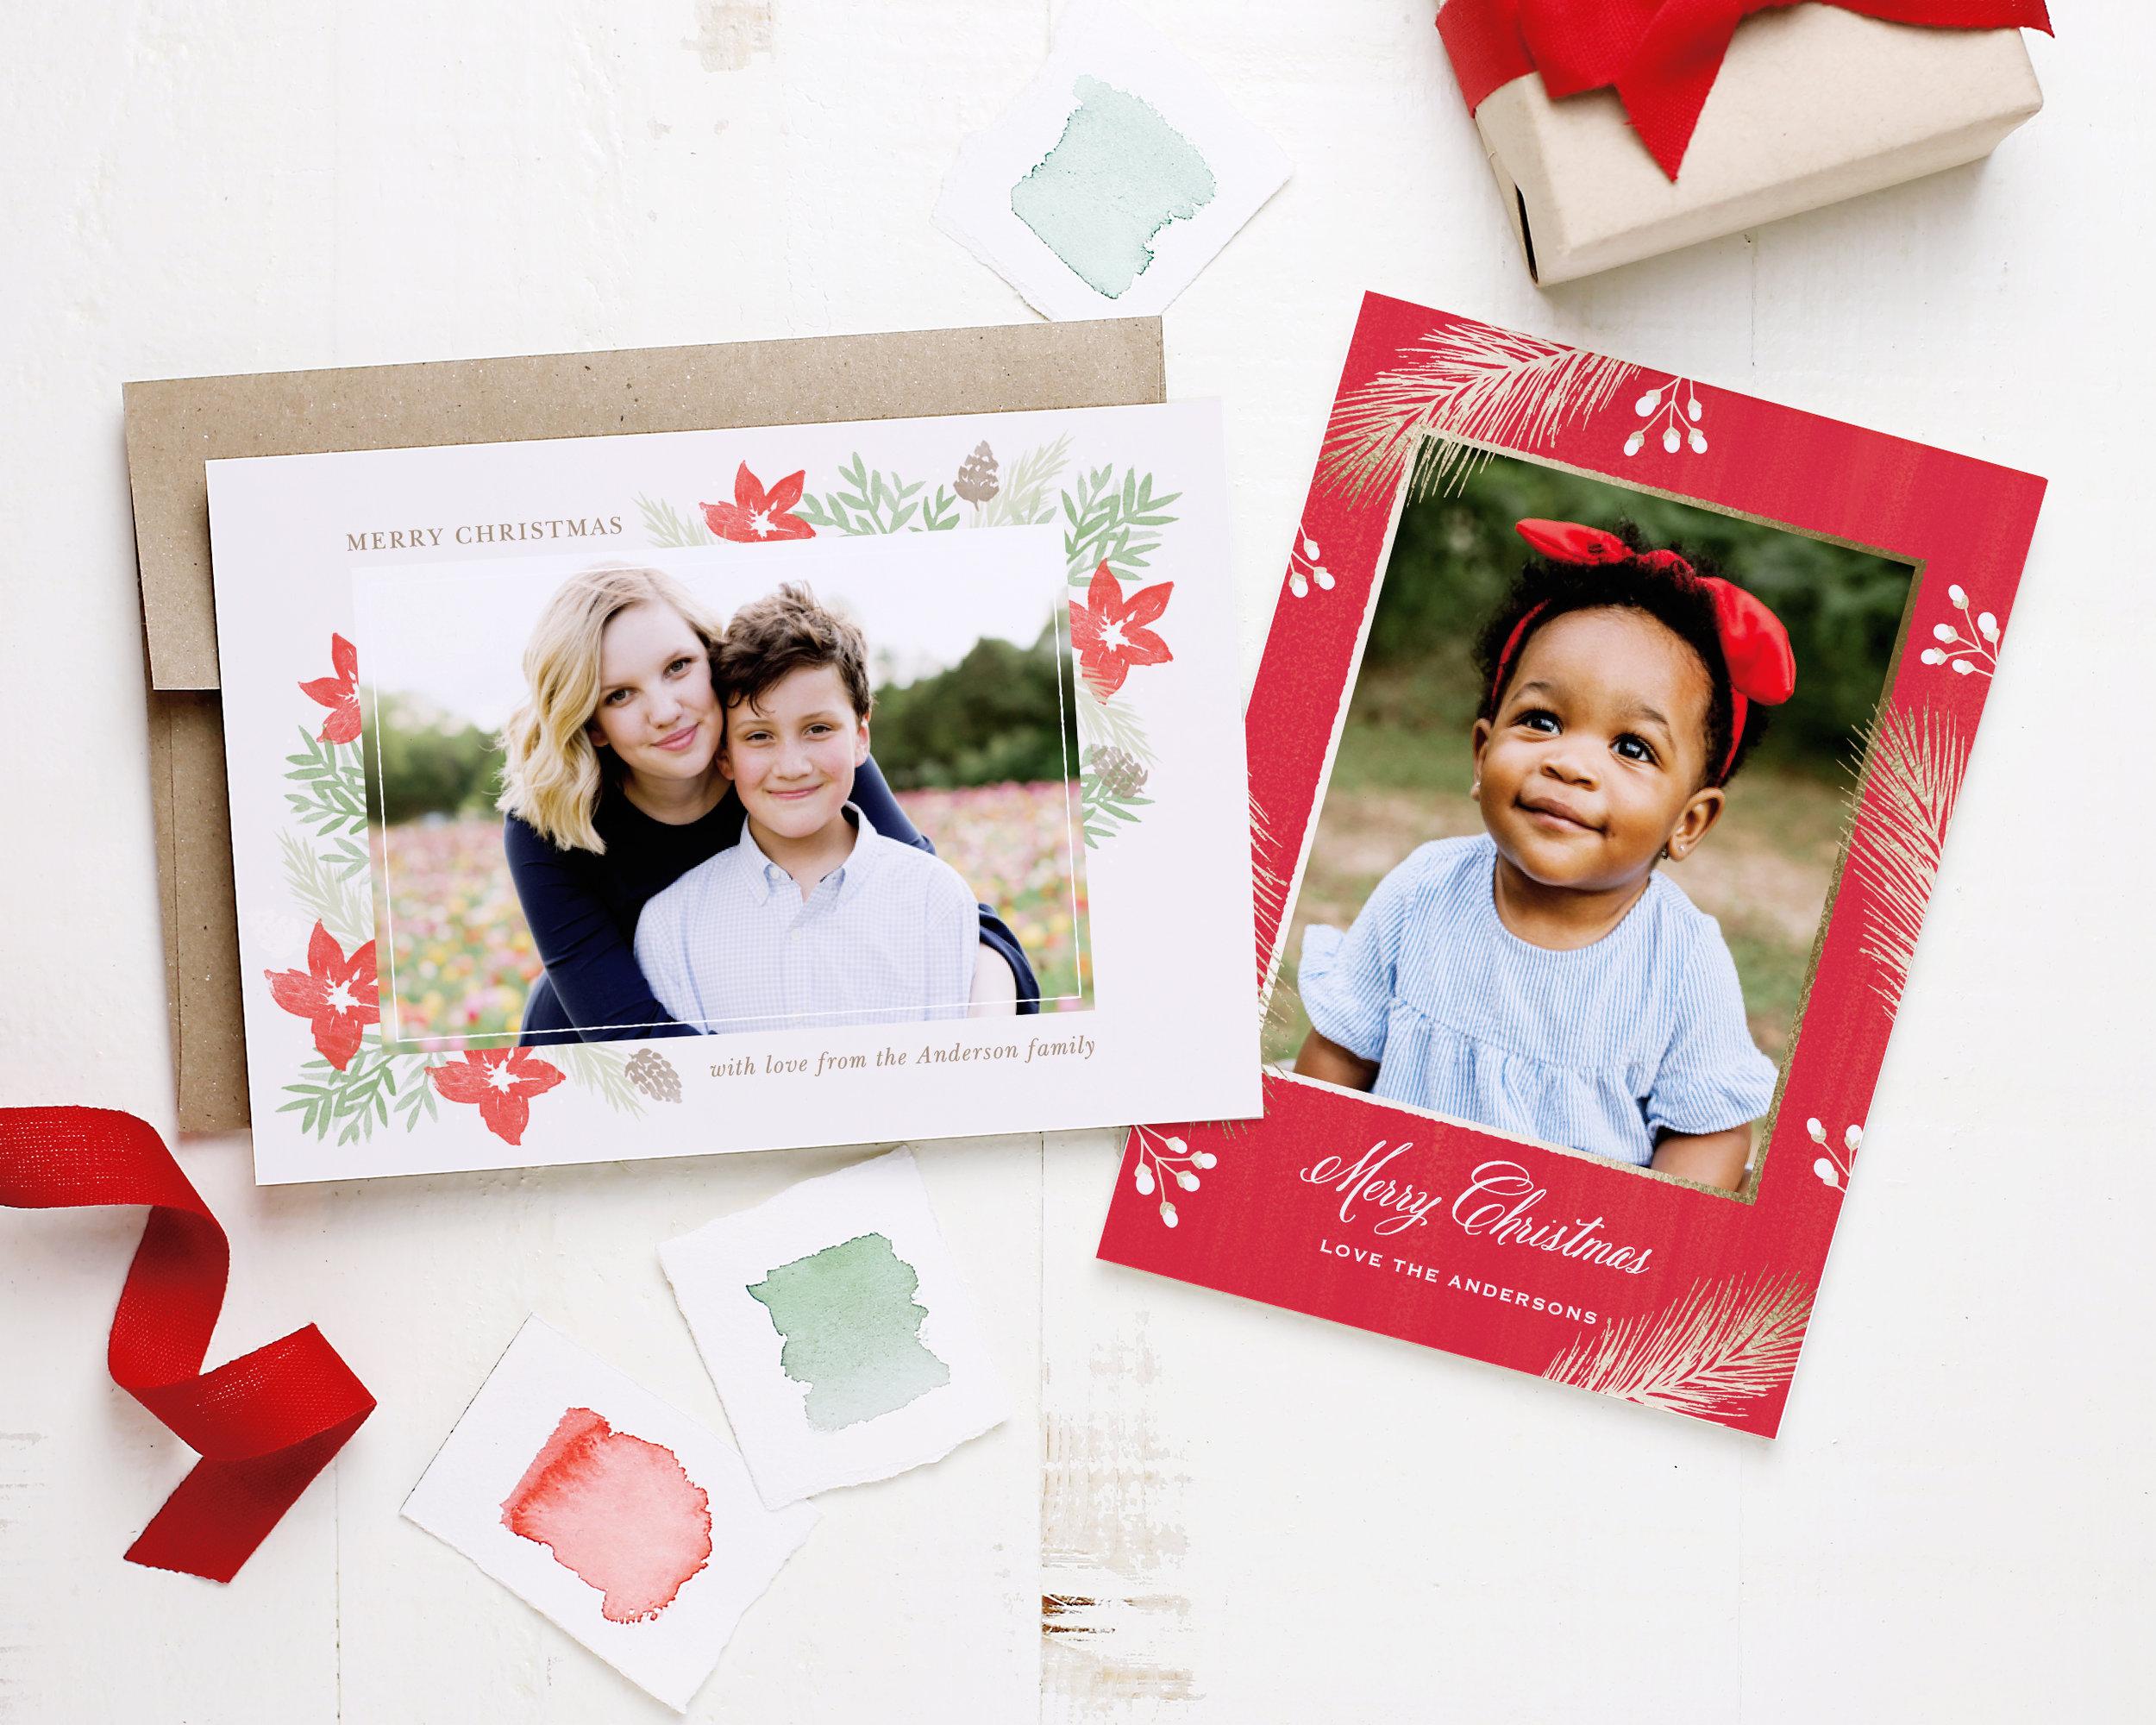 Basic_Invite_Holiday_Cards_22.jpg